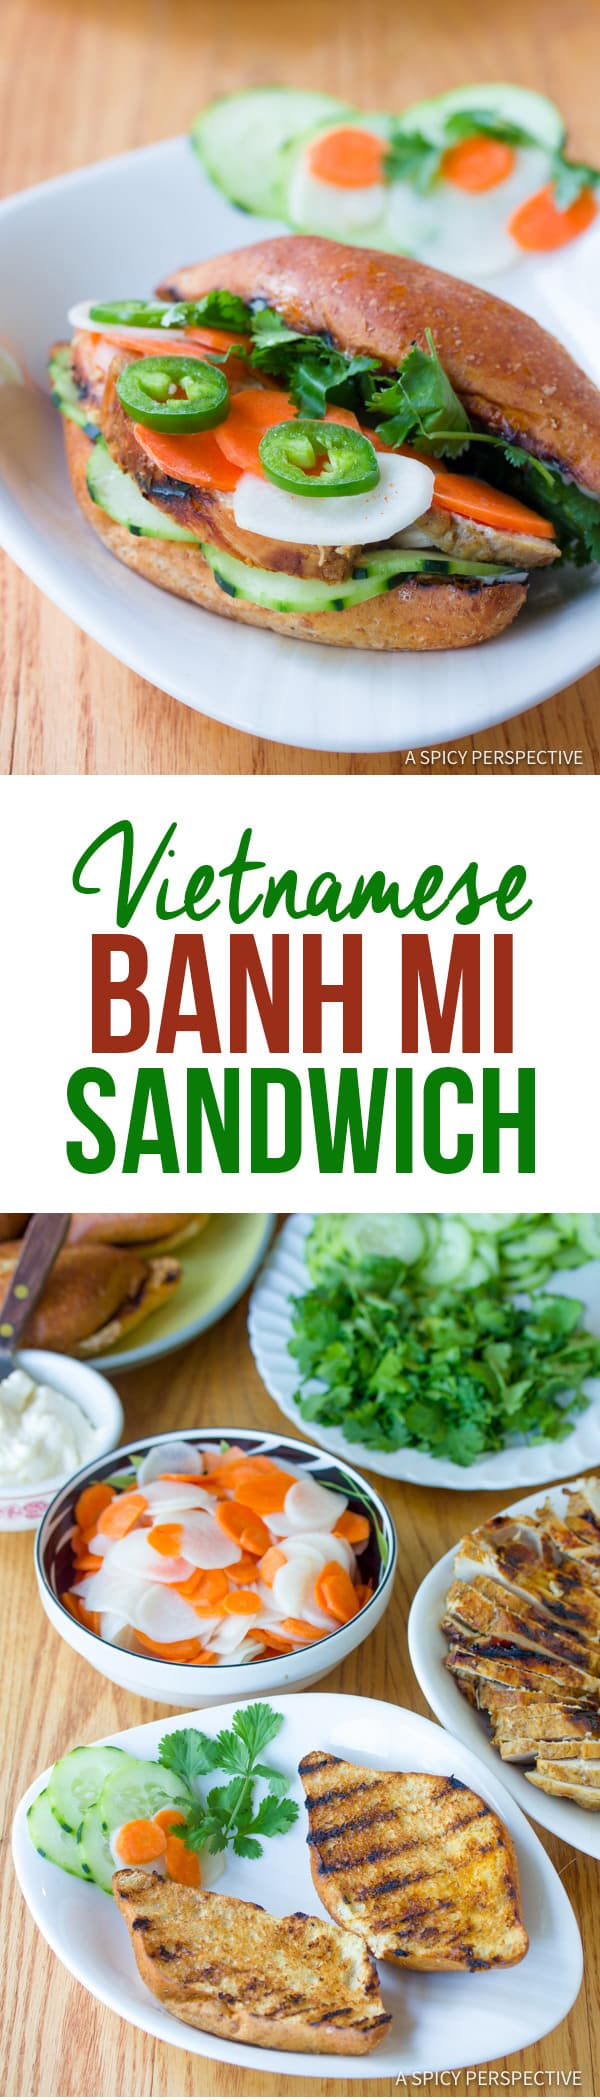 Perfect Vietnamese Banh Mi Sandwich | ASpicyPerspective.com